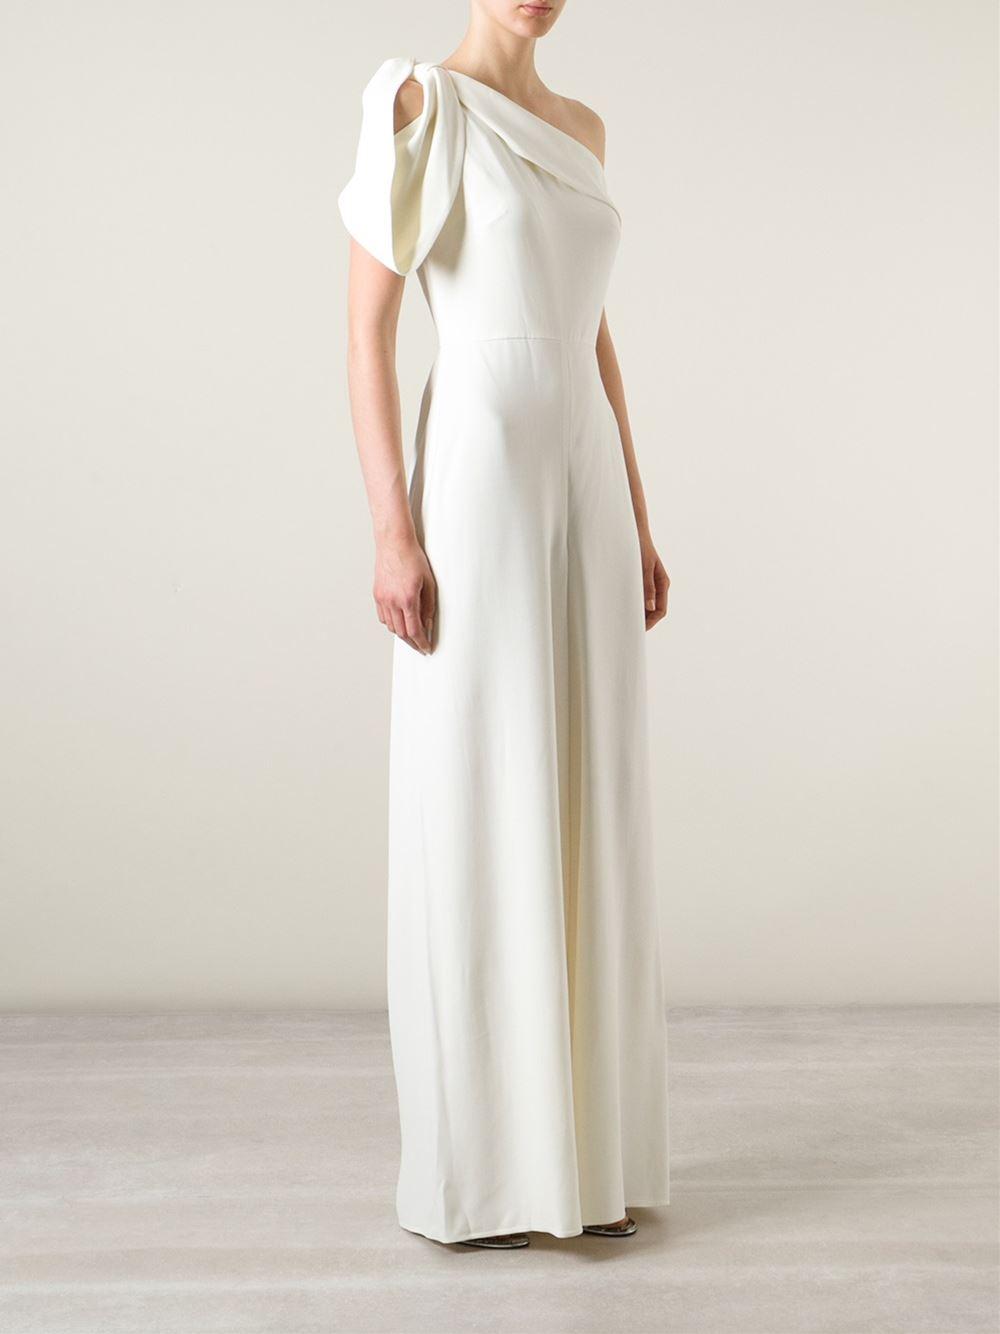 Lyst - Alexander Mcqueen One Shoulder Evening Gown in Natural